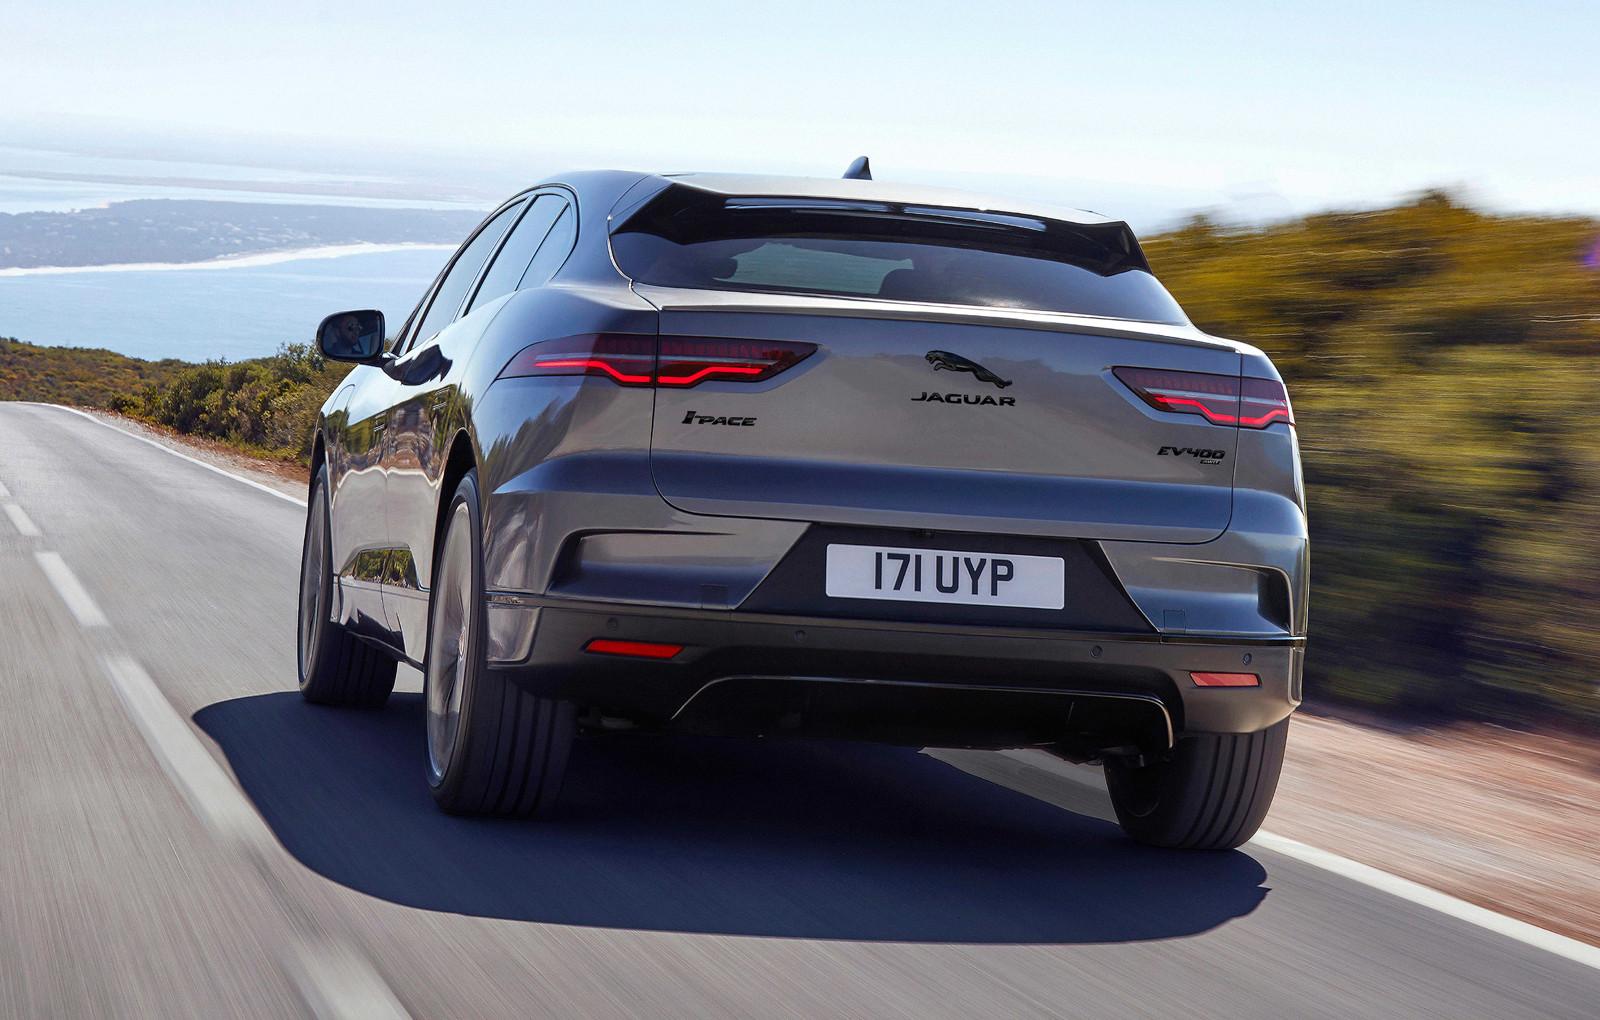 Jaguar I-Pace facelift - Jaguar I-Pace facelift